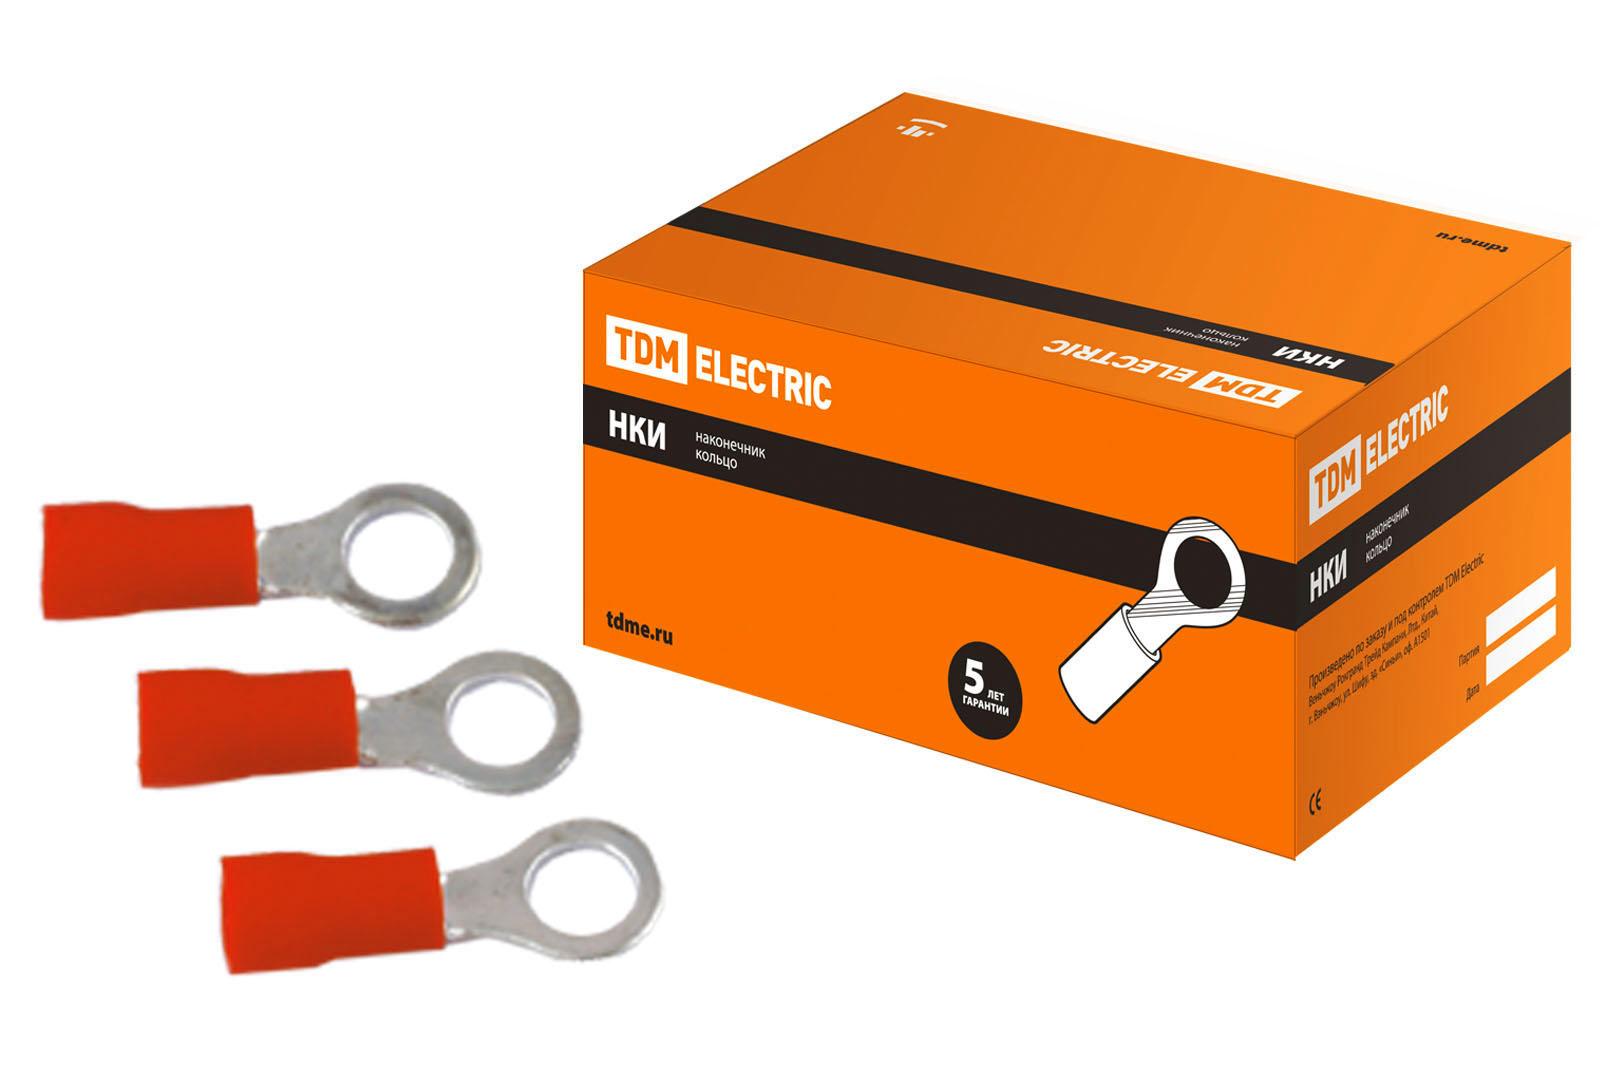 Наконечник НКИ 1,25-4 кольцо 0,5-1,5мм (100шт) TDM SQ0502-0001 TDM Electric